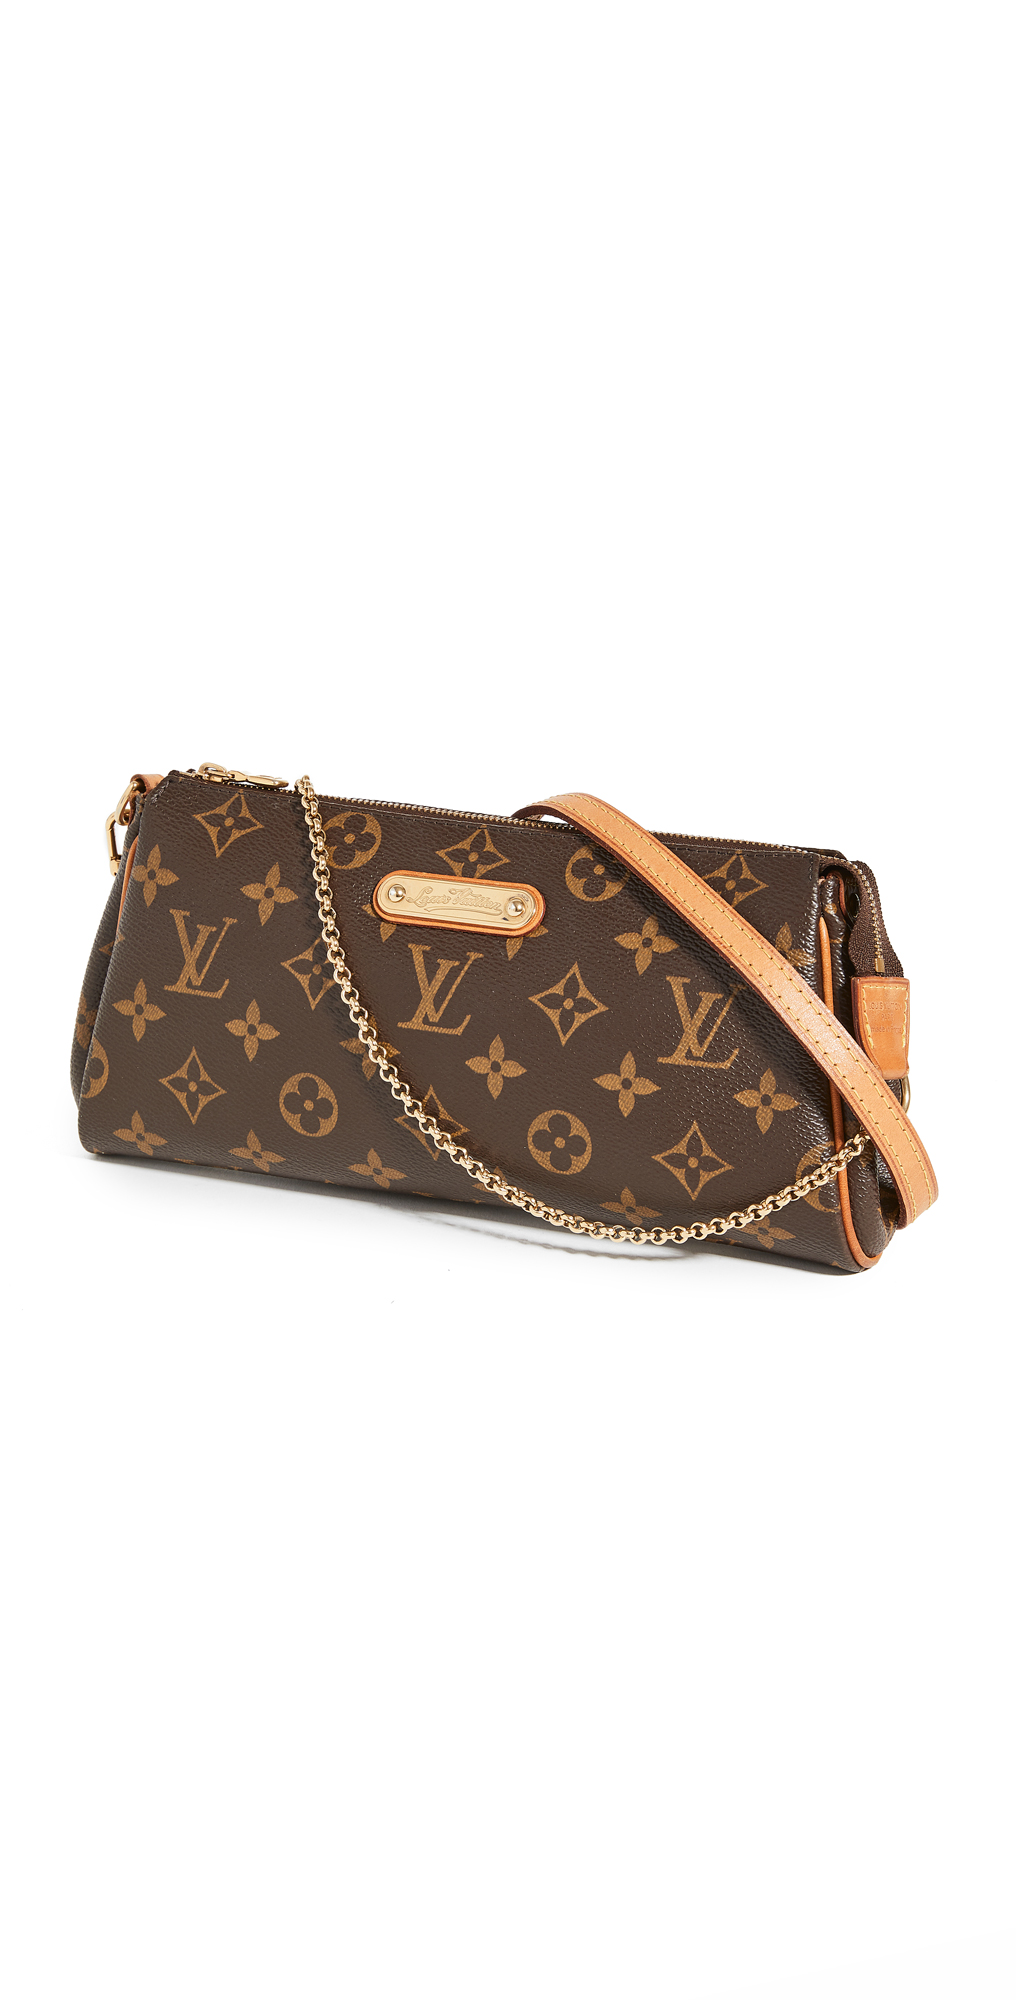 What Goes Around Comes Around Louis Vuitton Monogram Eva Bag